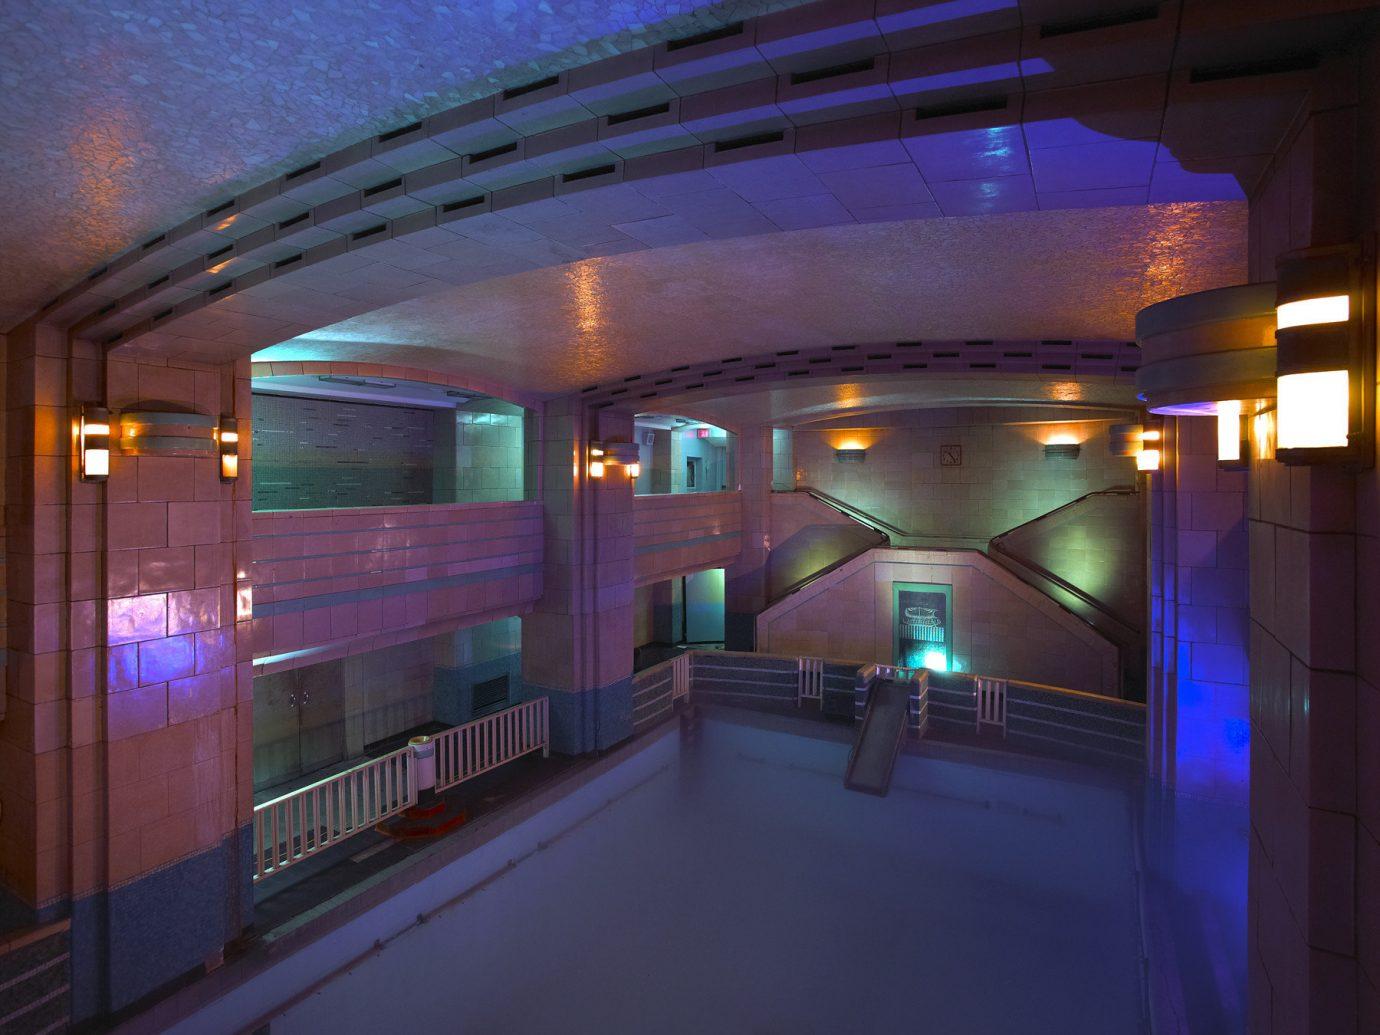 Hotels building ceiling light night lighting swimming pool interior design platform subway